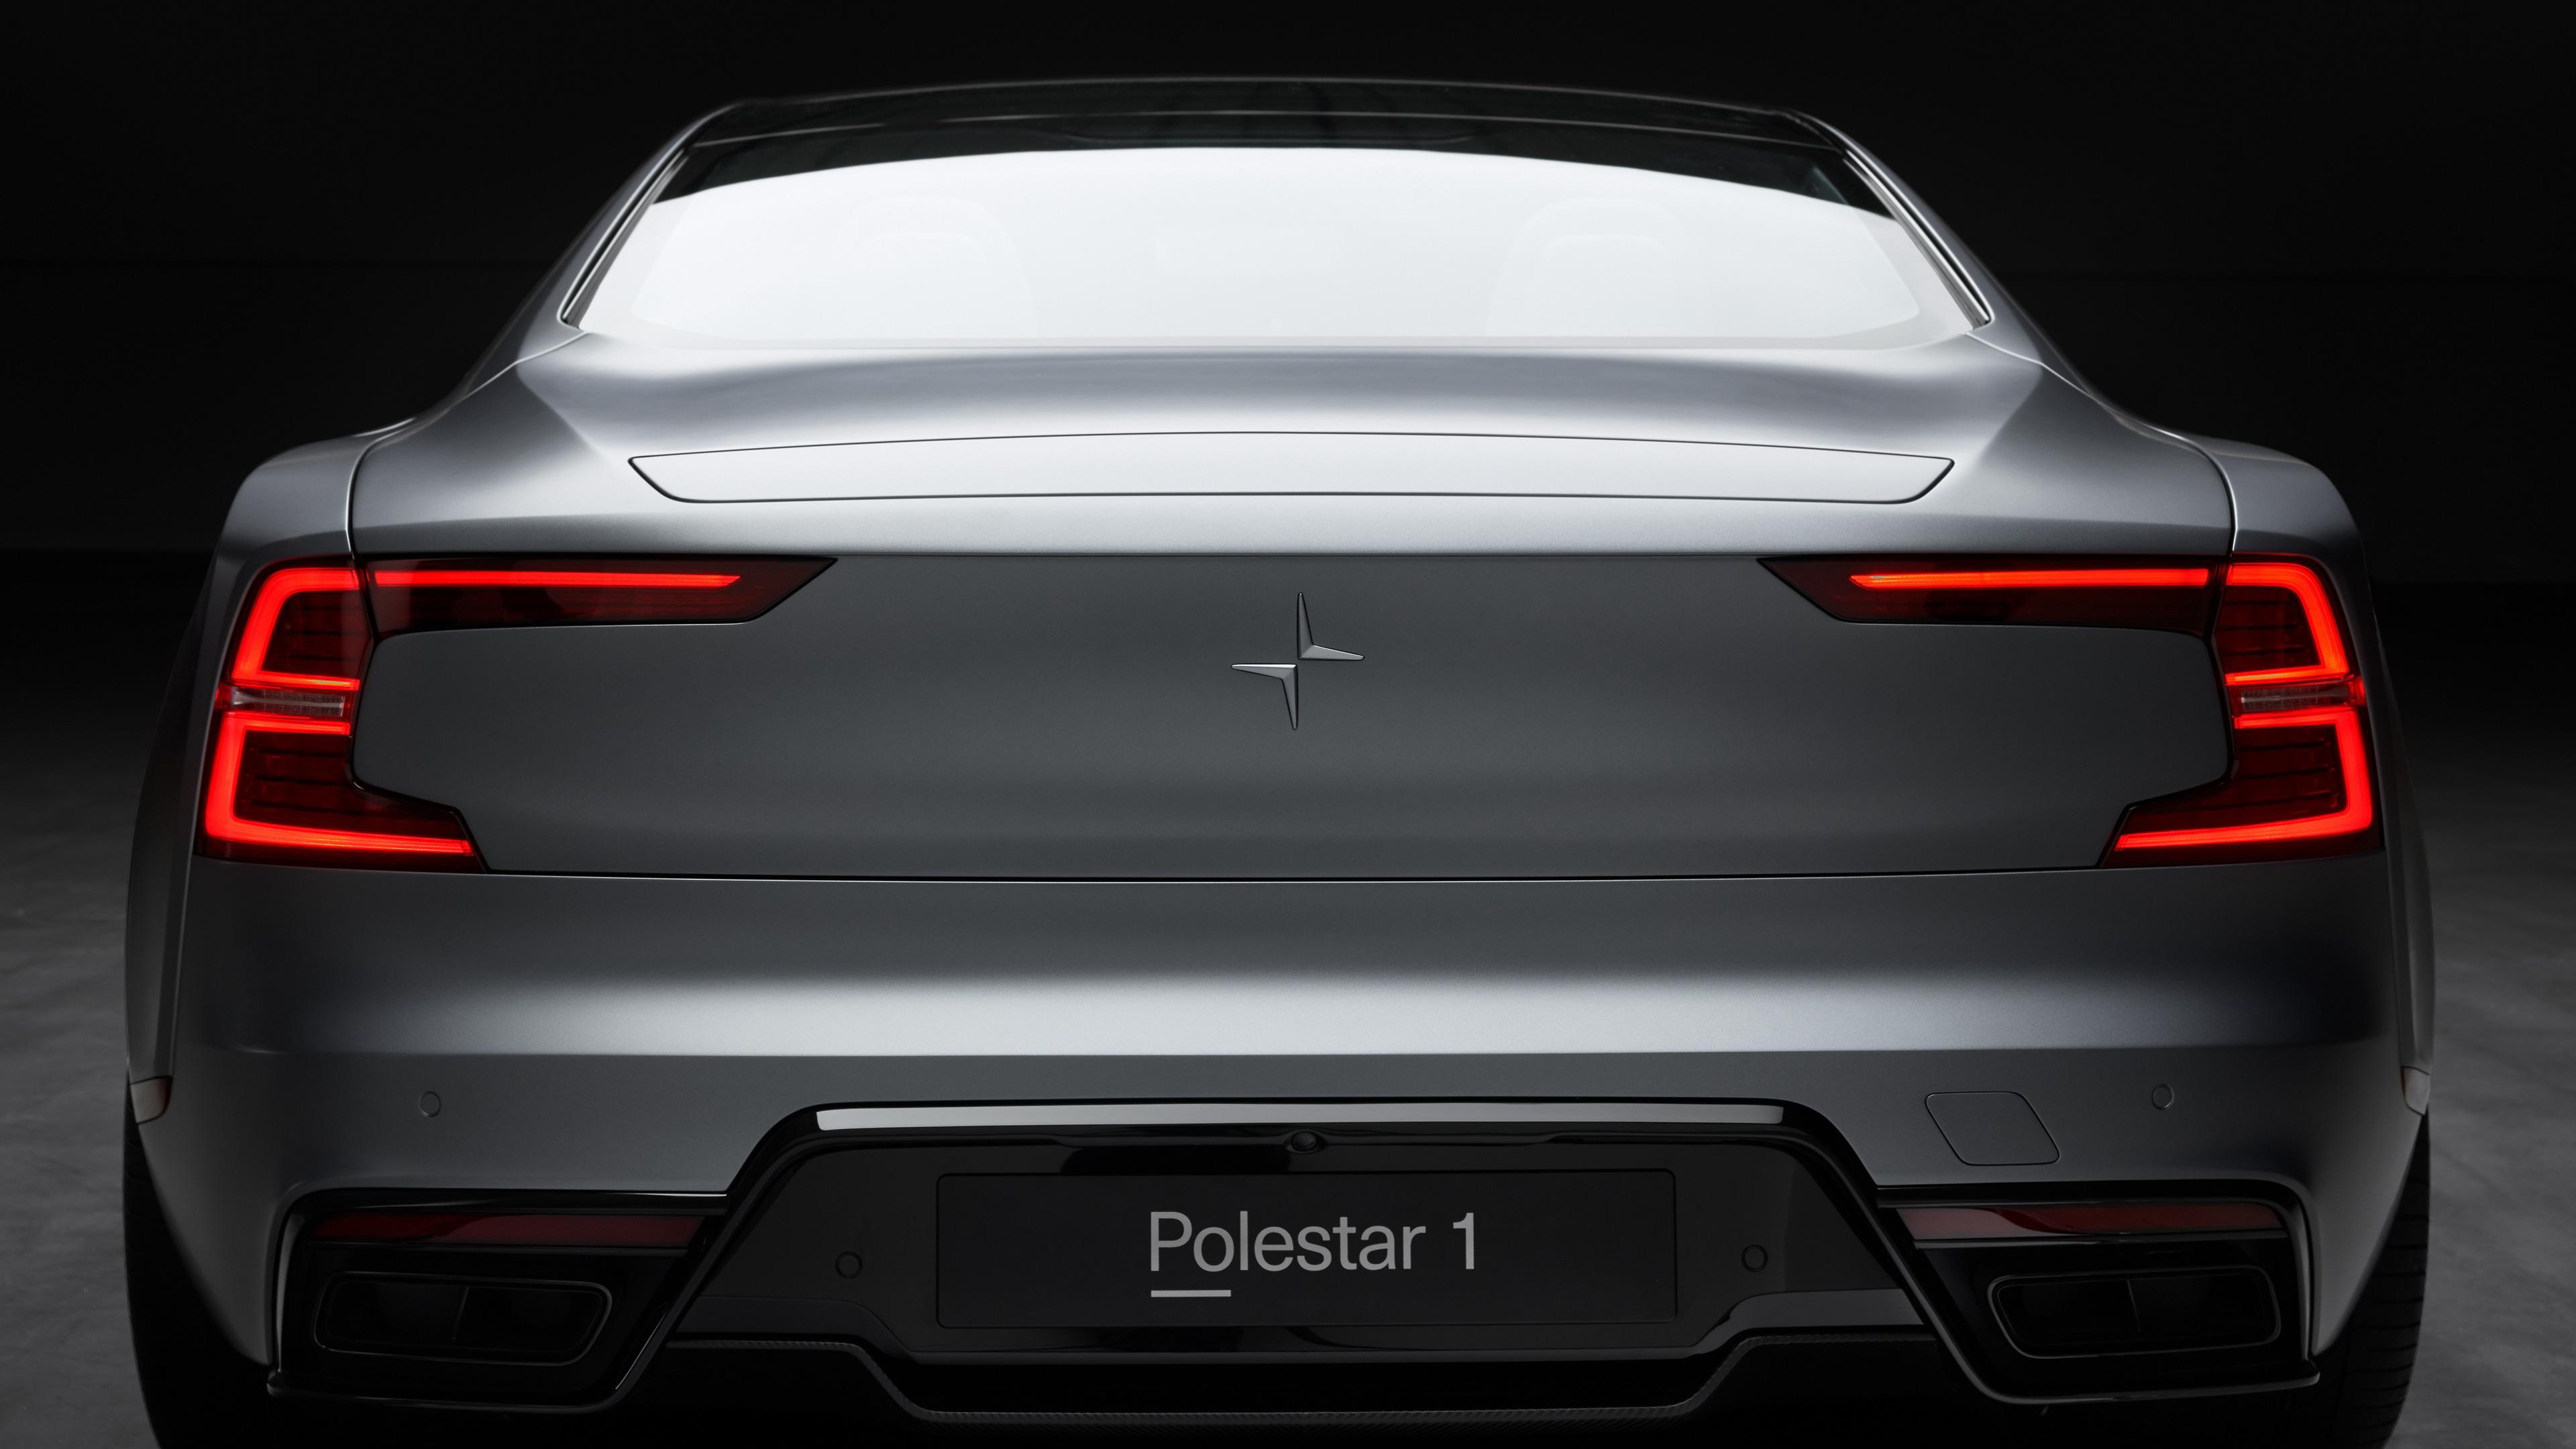 polestar 1 rear 4k 1539110258 - Polestar 1 Rear 4k - polestar 1 wallpapers, hd-wallpapers, cars wallpapers, 4k-wallpapers, 2019 cars wallpapers